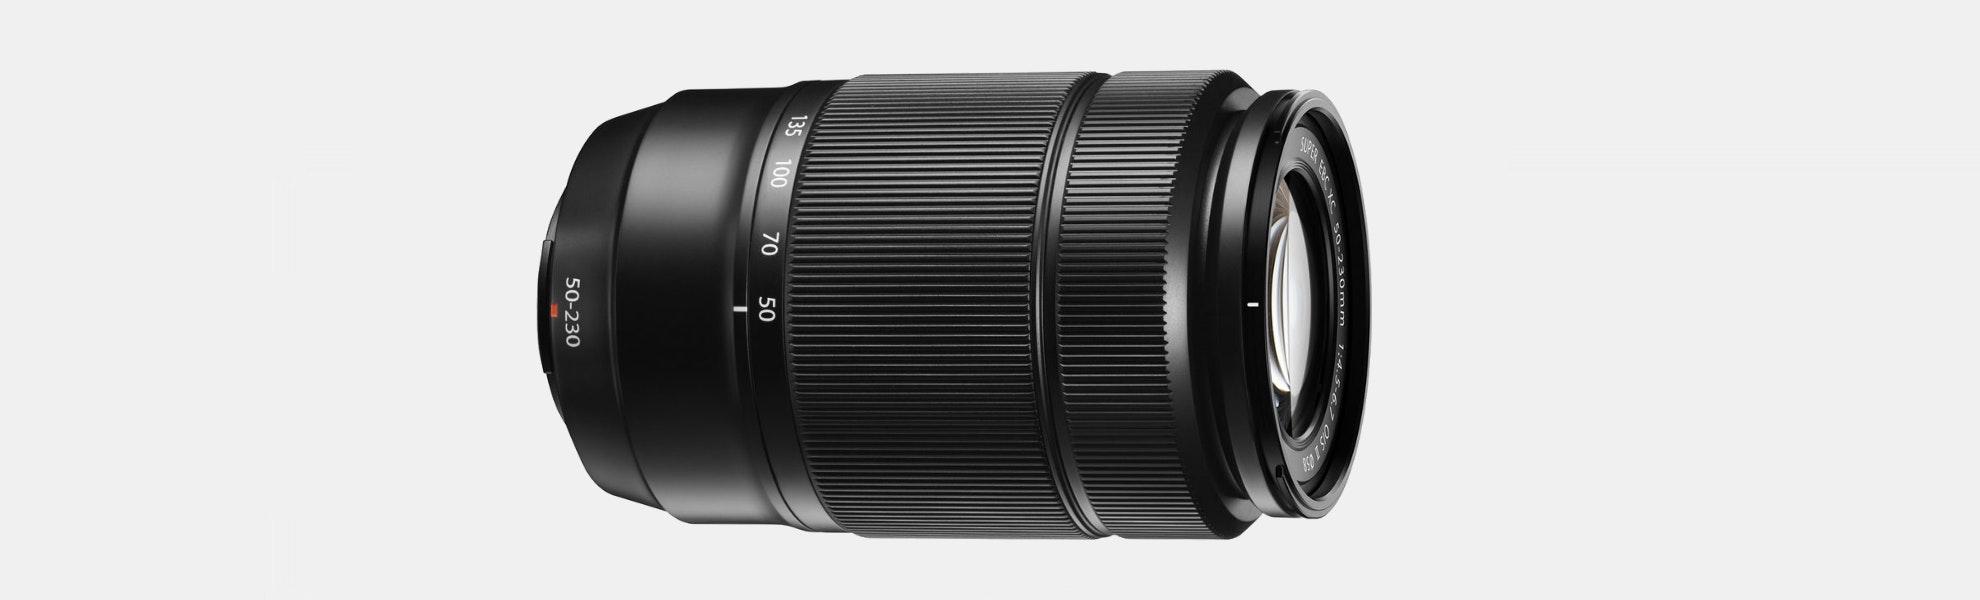 Fujinon XC 50–230mm F4.5–6.7 OIS II Lens